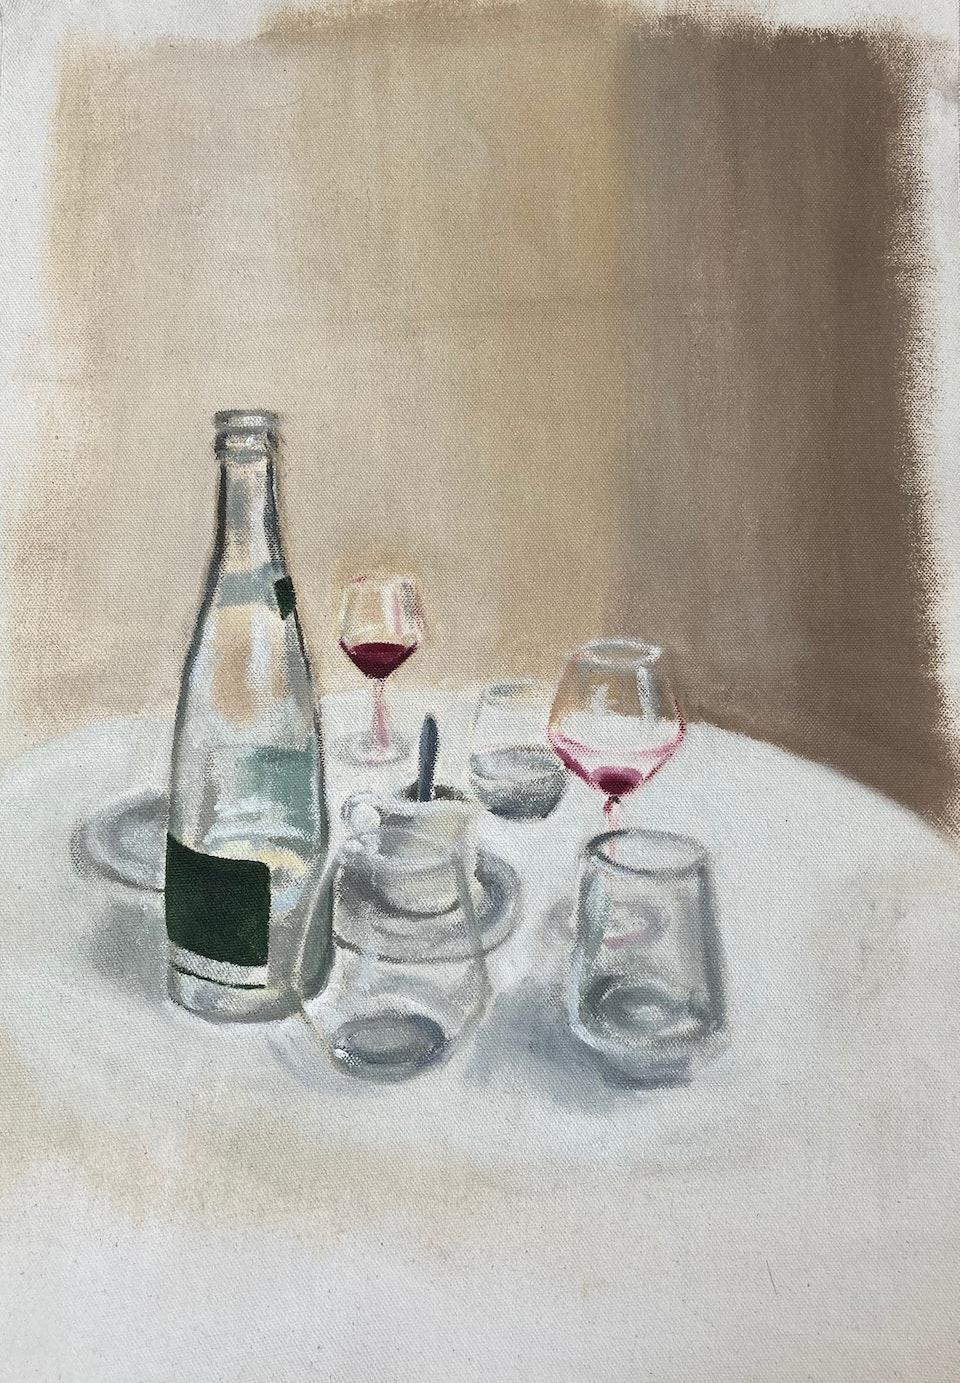 Interiors - Soufflé - 2020 - Oil on Canvas - 30 x 42cm